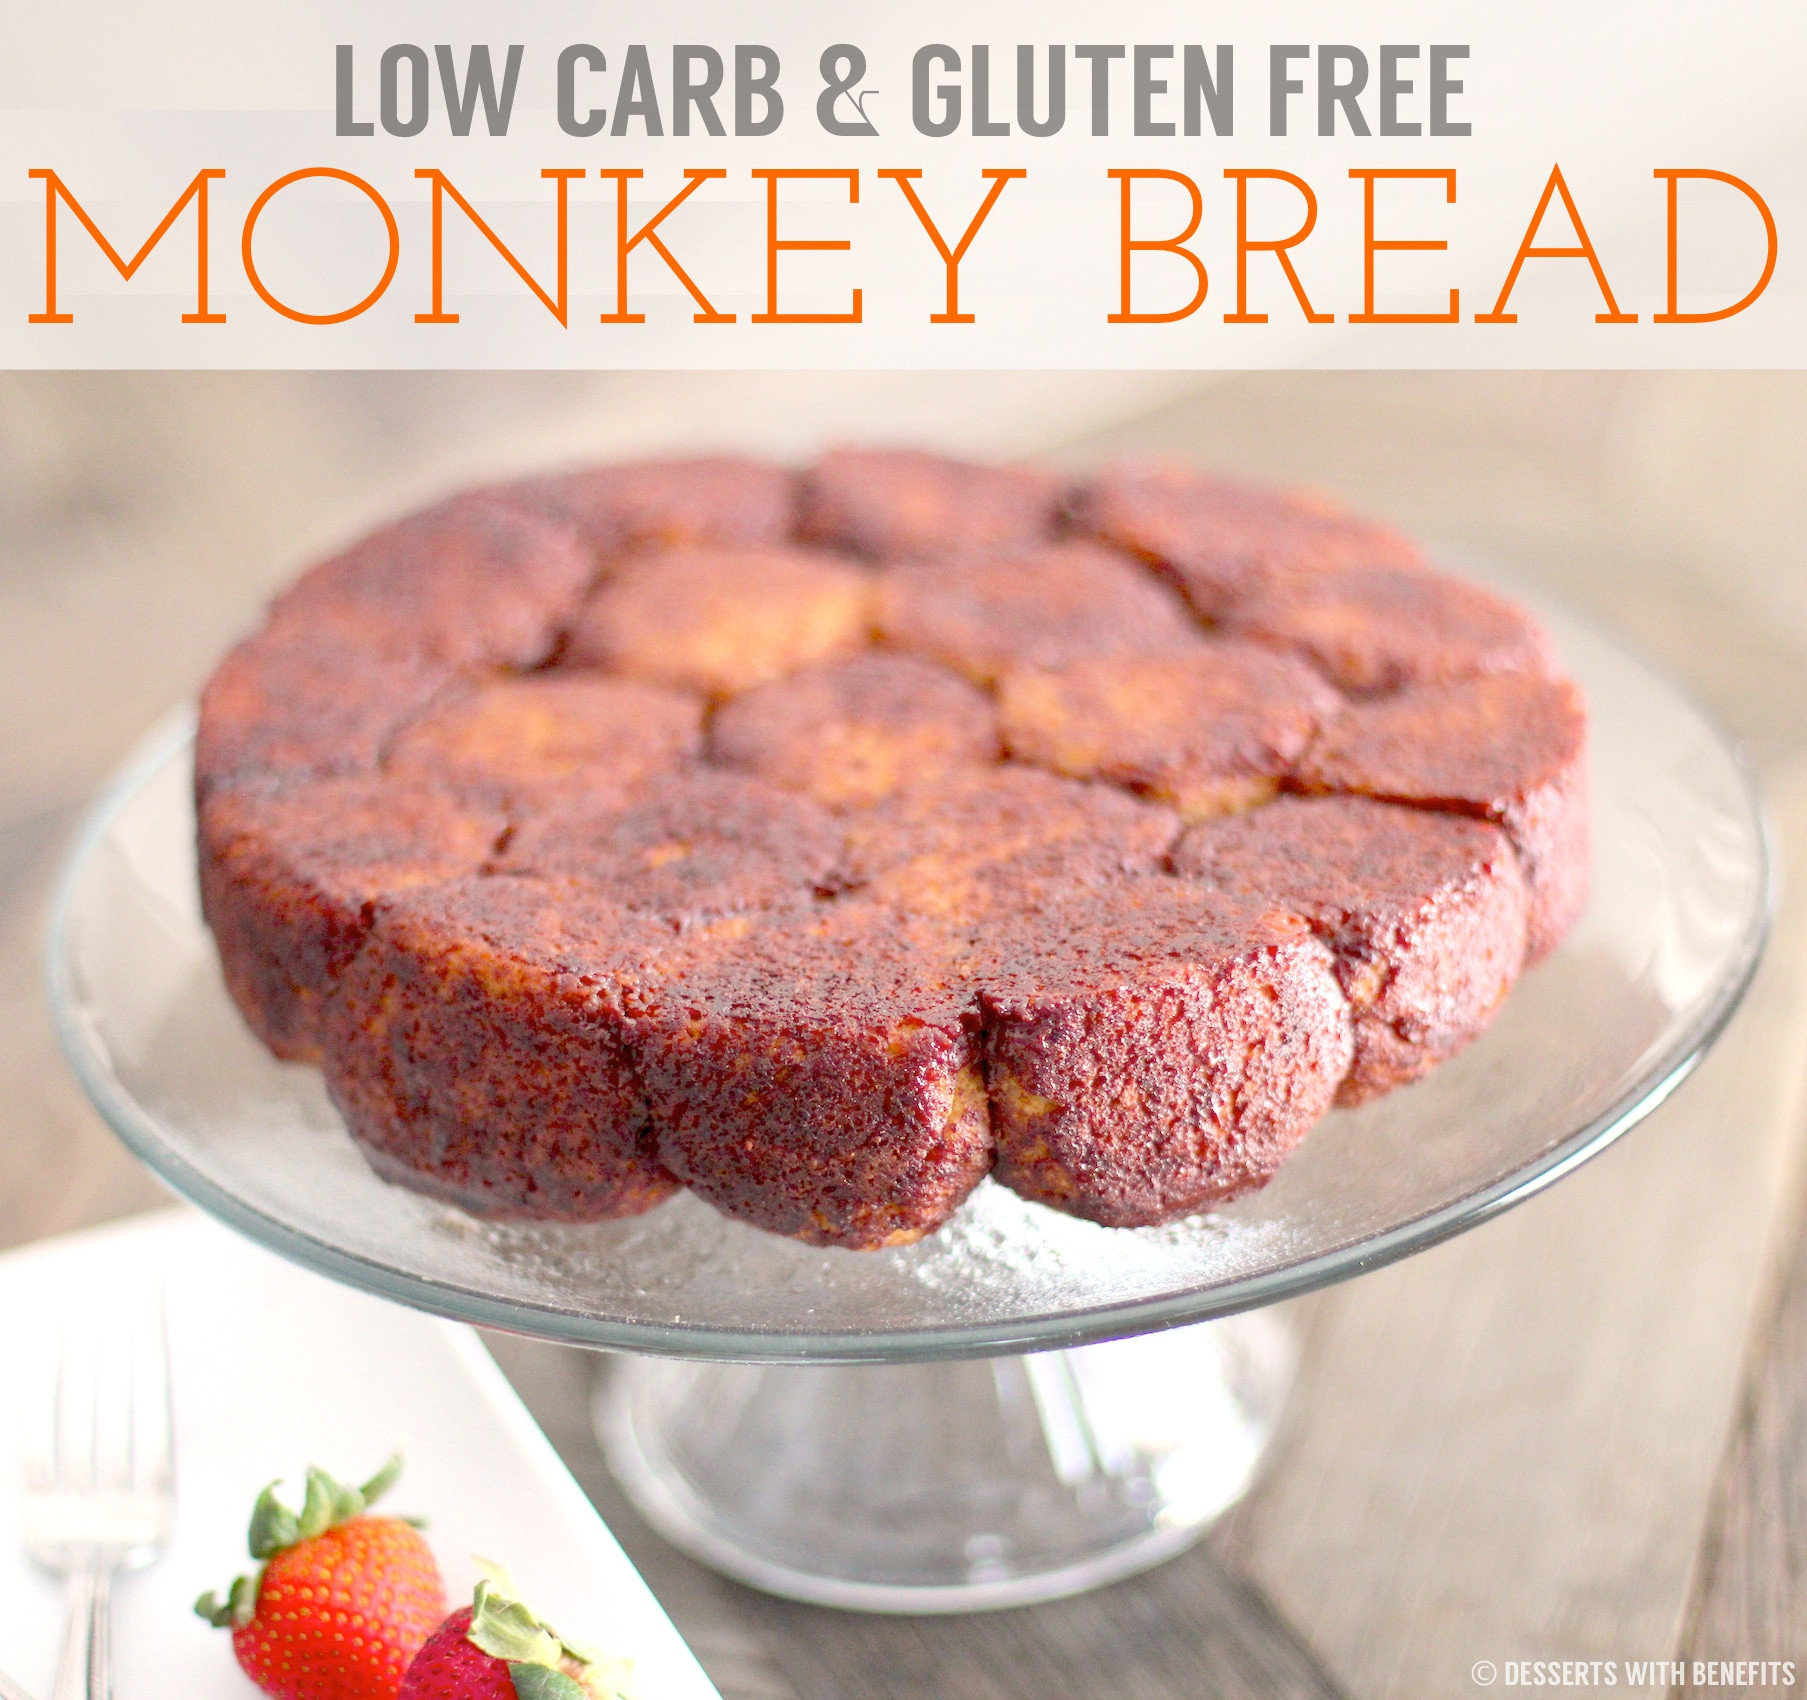 Low Carb Dairy Free Desserts  Healthy Gluten Free Monkey Bread Recipe